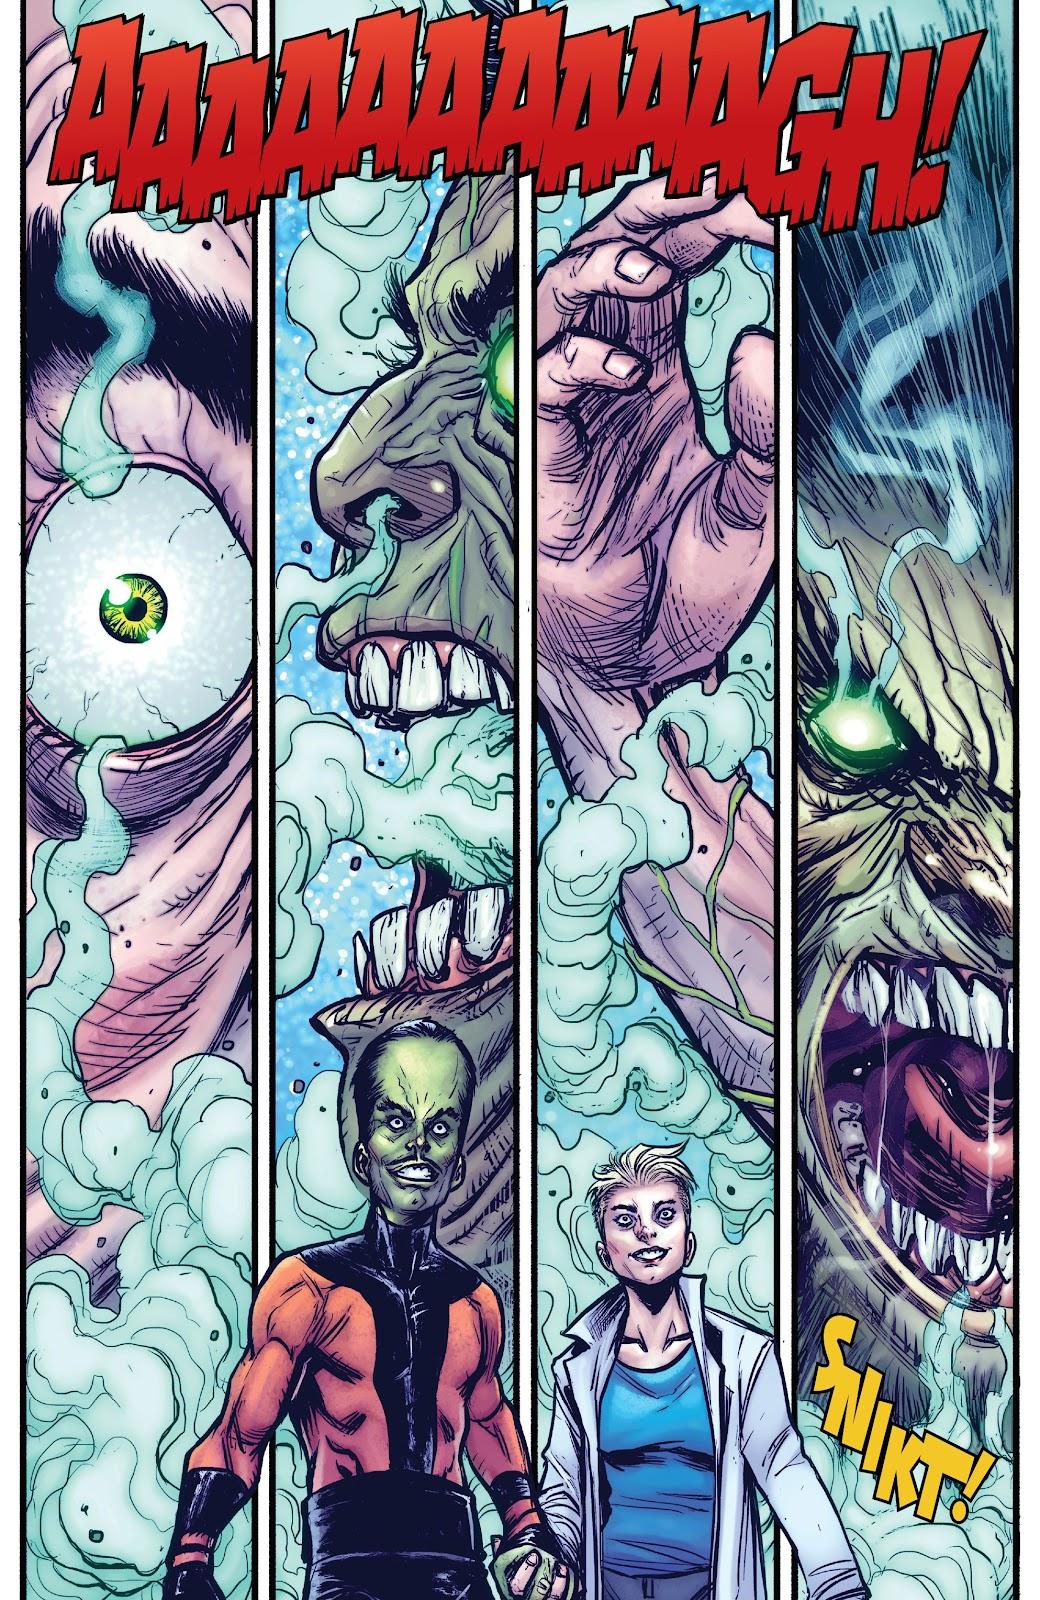 Read online Hulkverines comic -  Issue #3 - 12